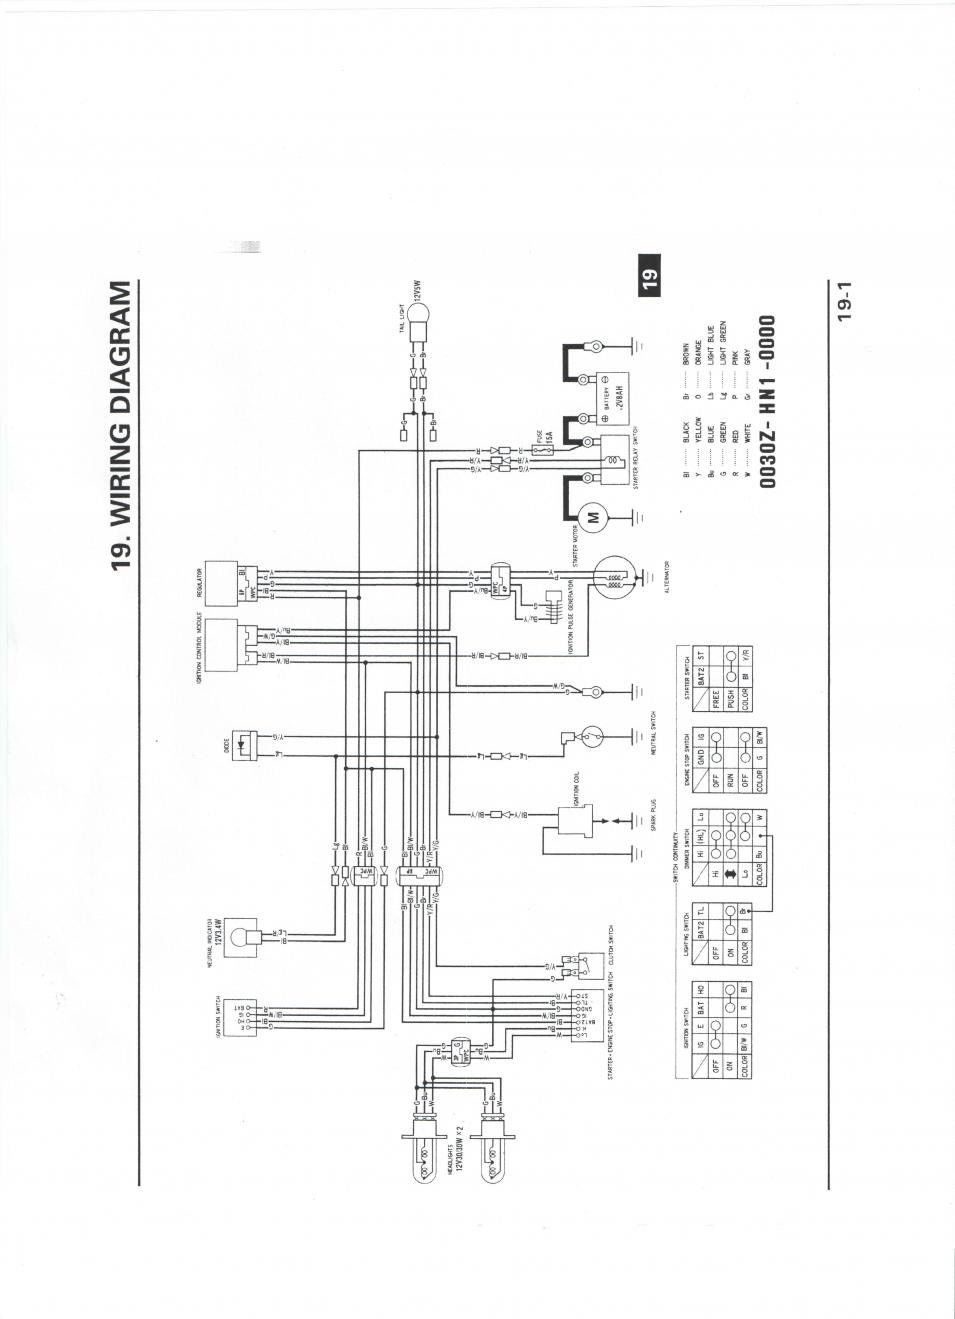 Honda 400ex Ignition Wiring Diagram 5 Pin Relay Wiring Diagram Ground Begeboy Wiring Diagram Source